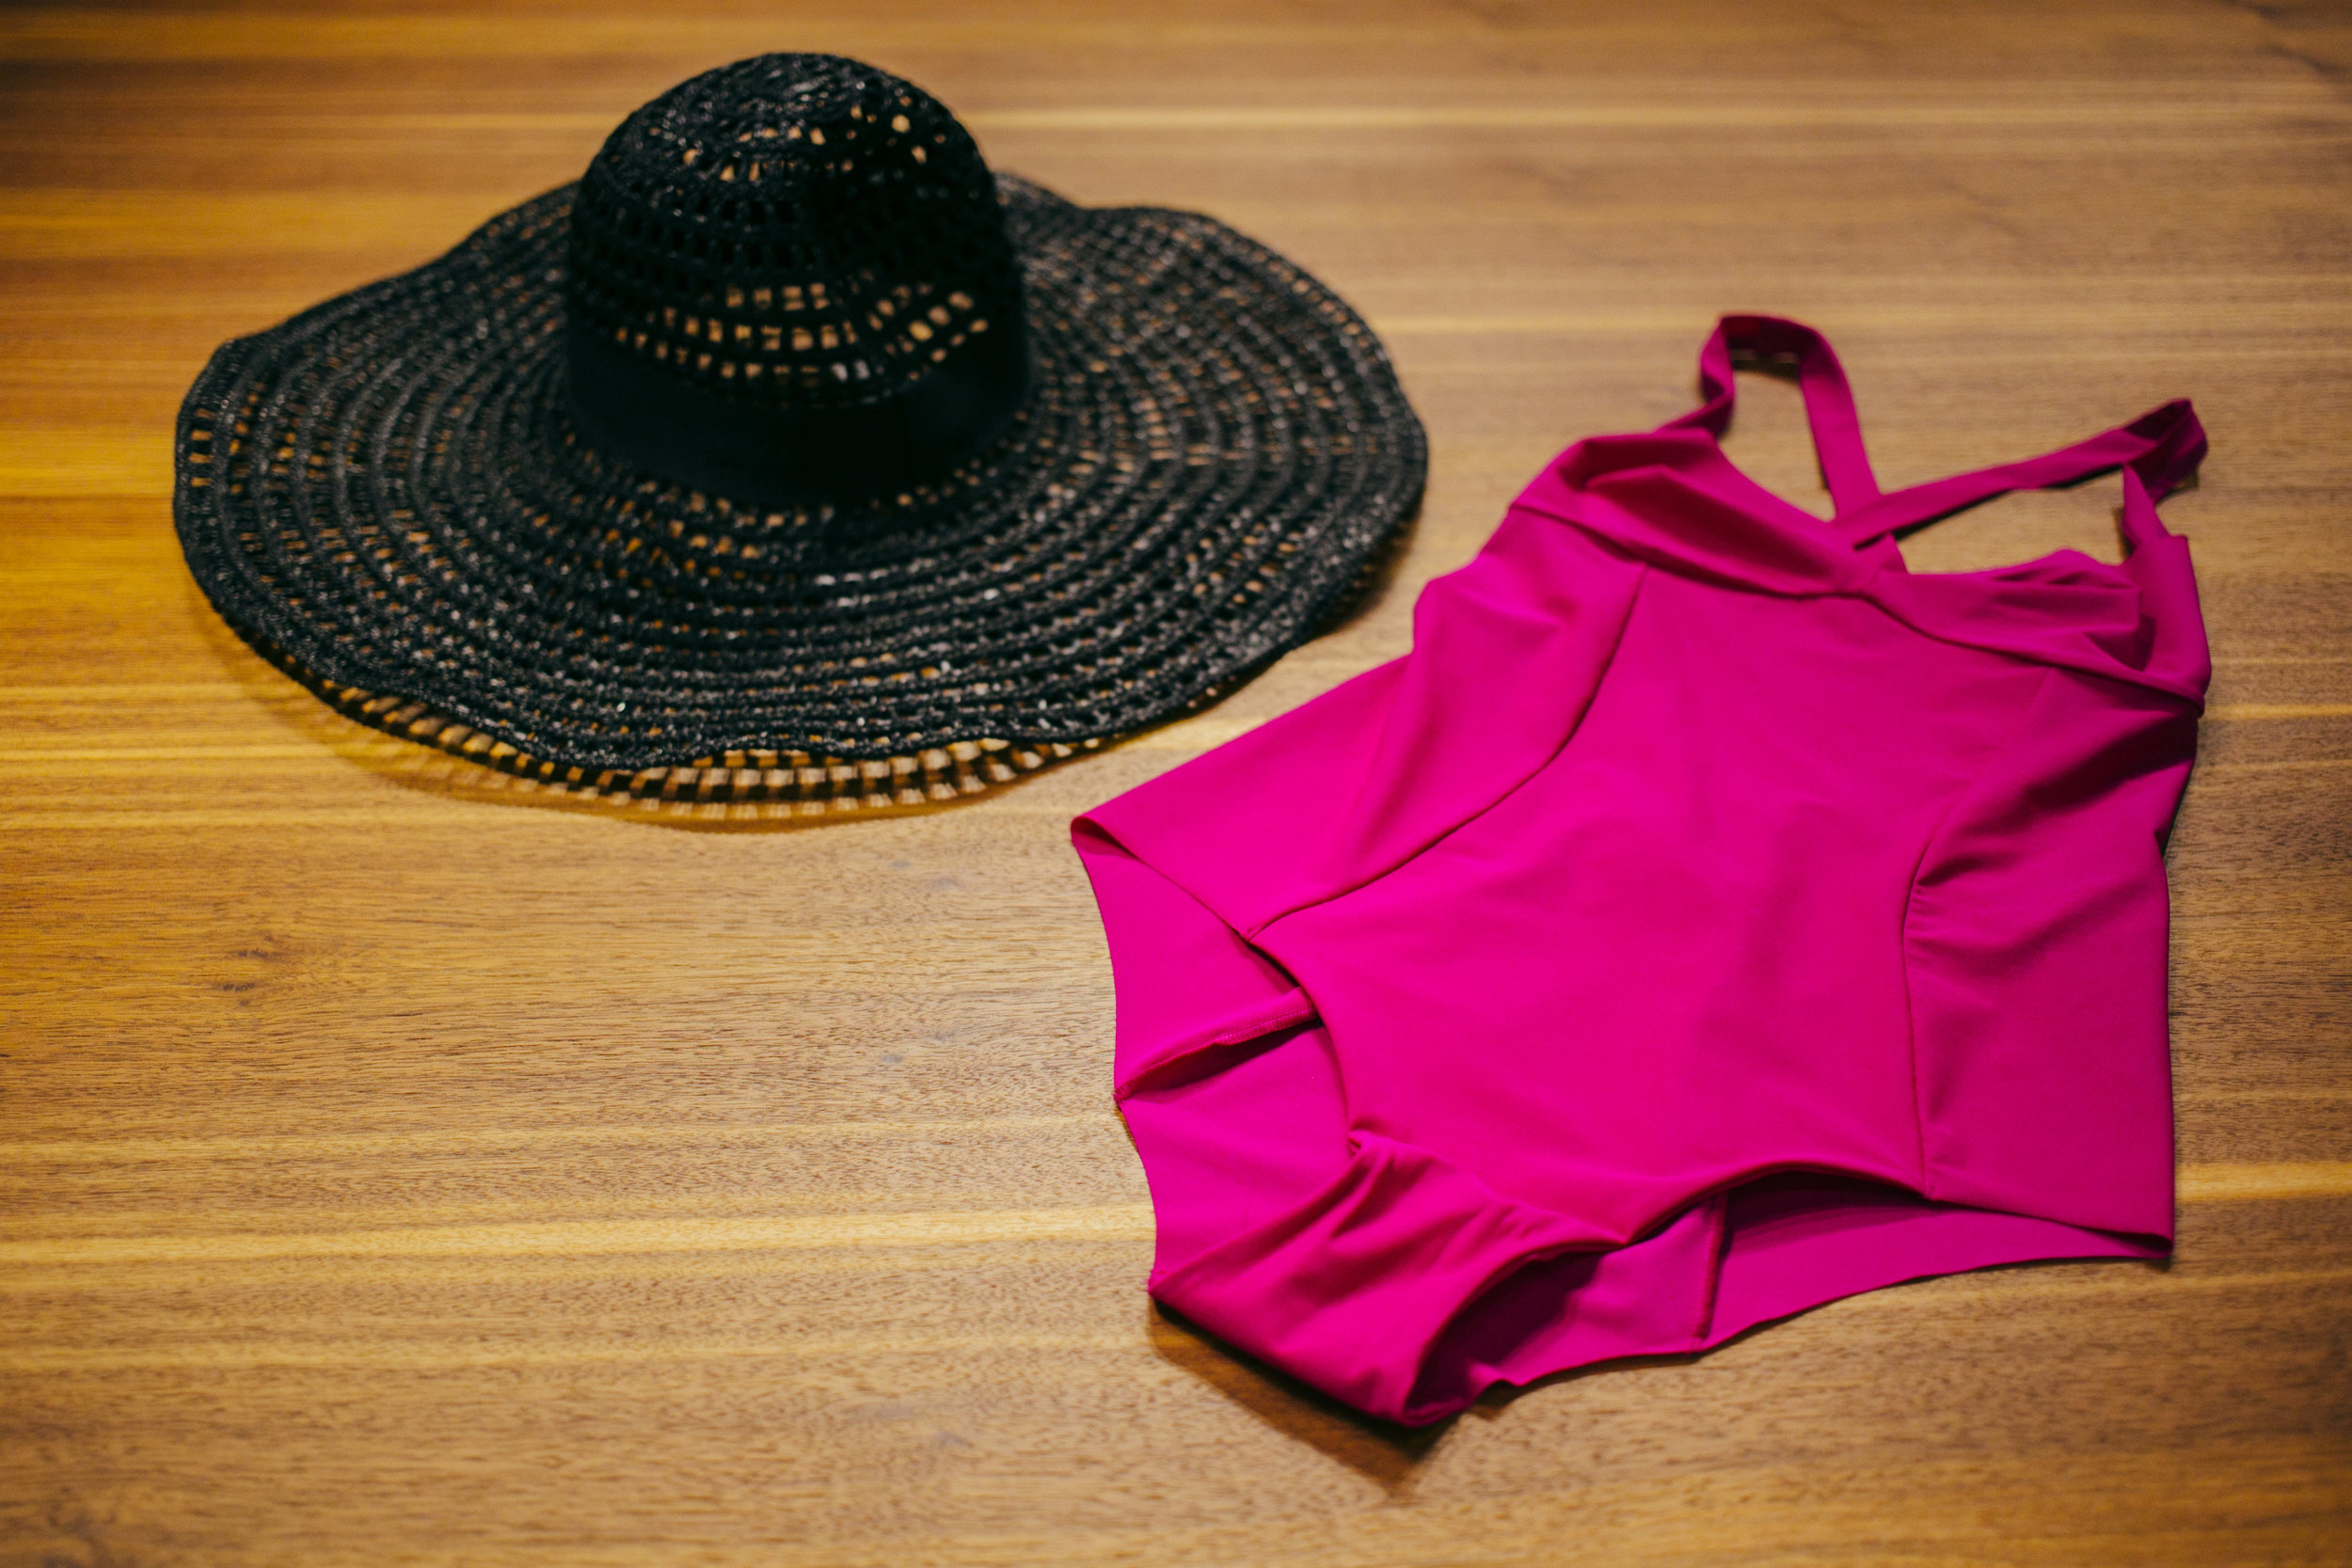 Yamamay- едноделен костим за капењеWeekend Max Mara- шешир